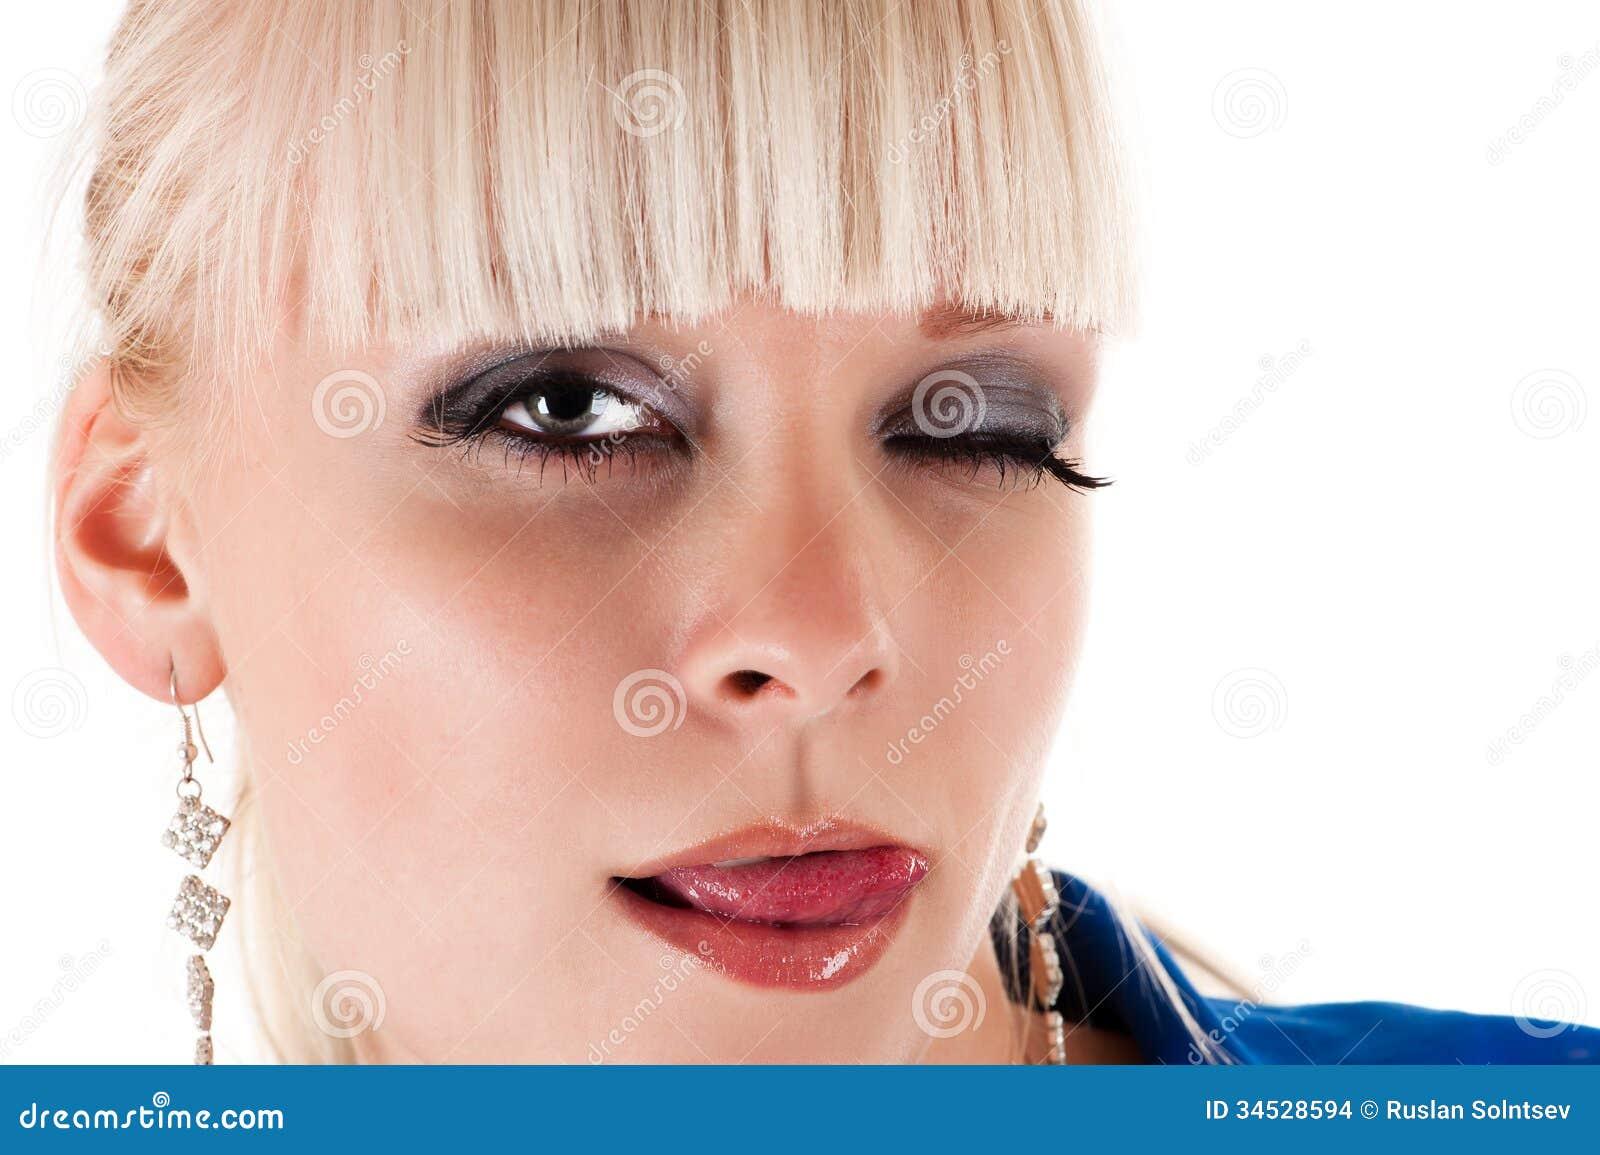 Lick lips woman